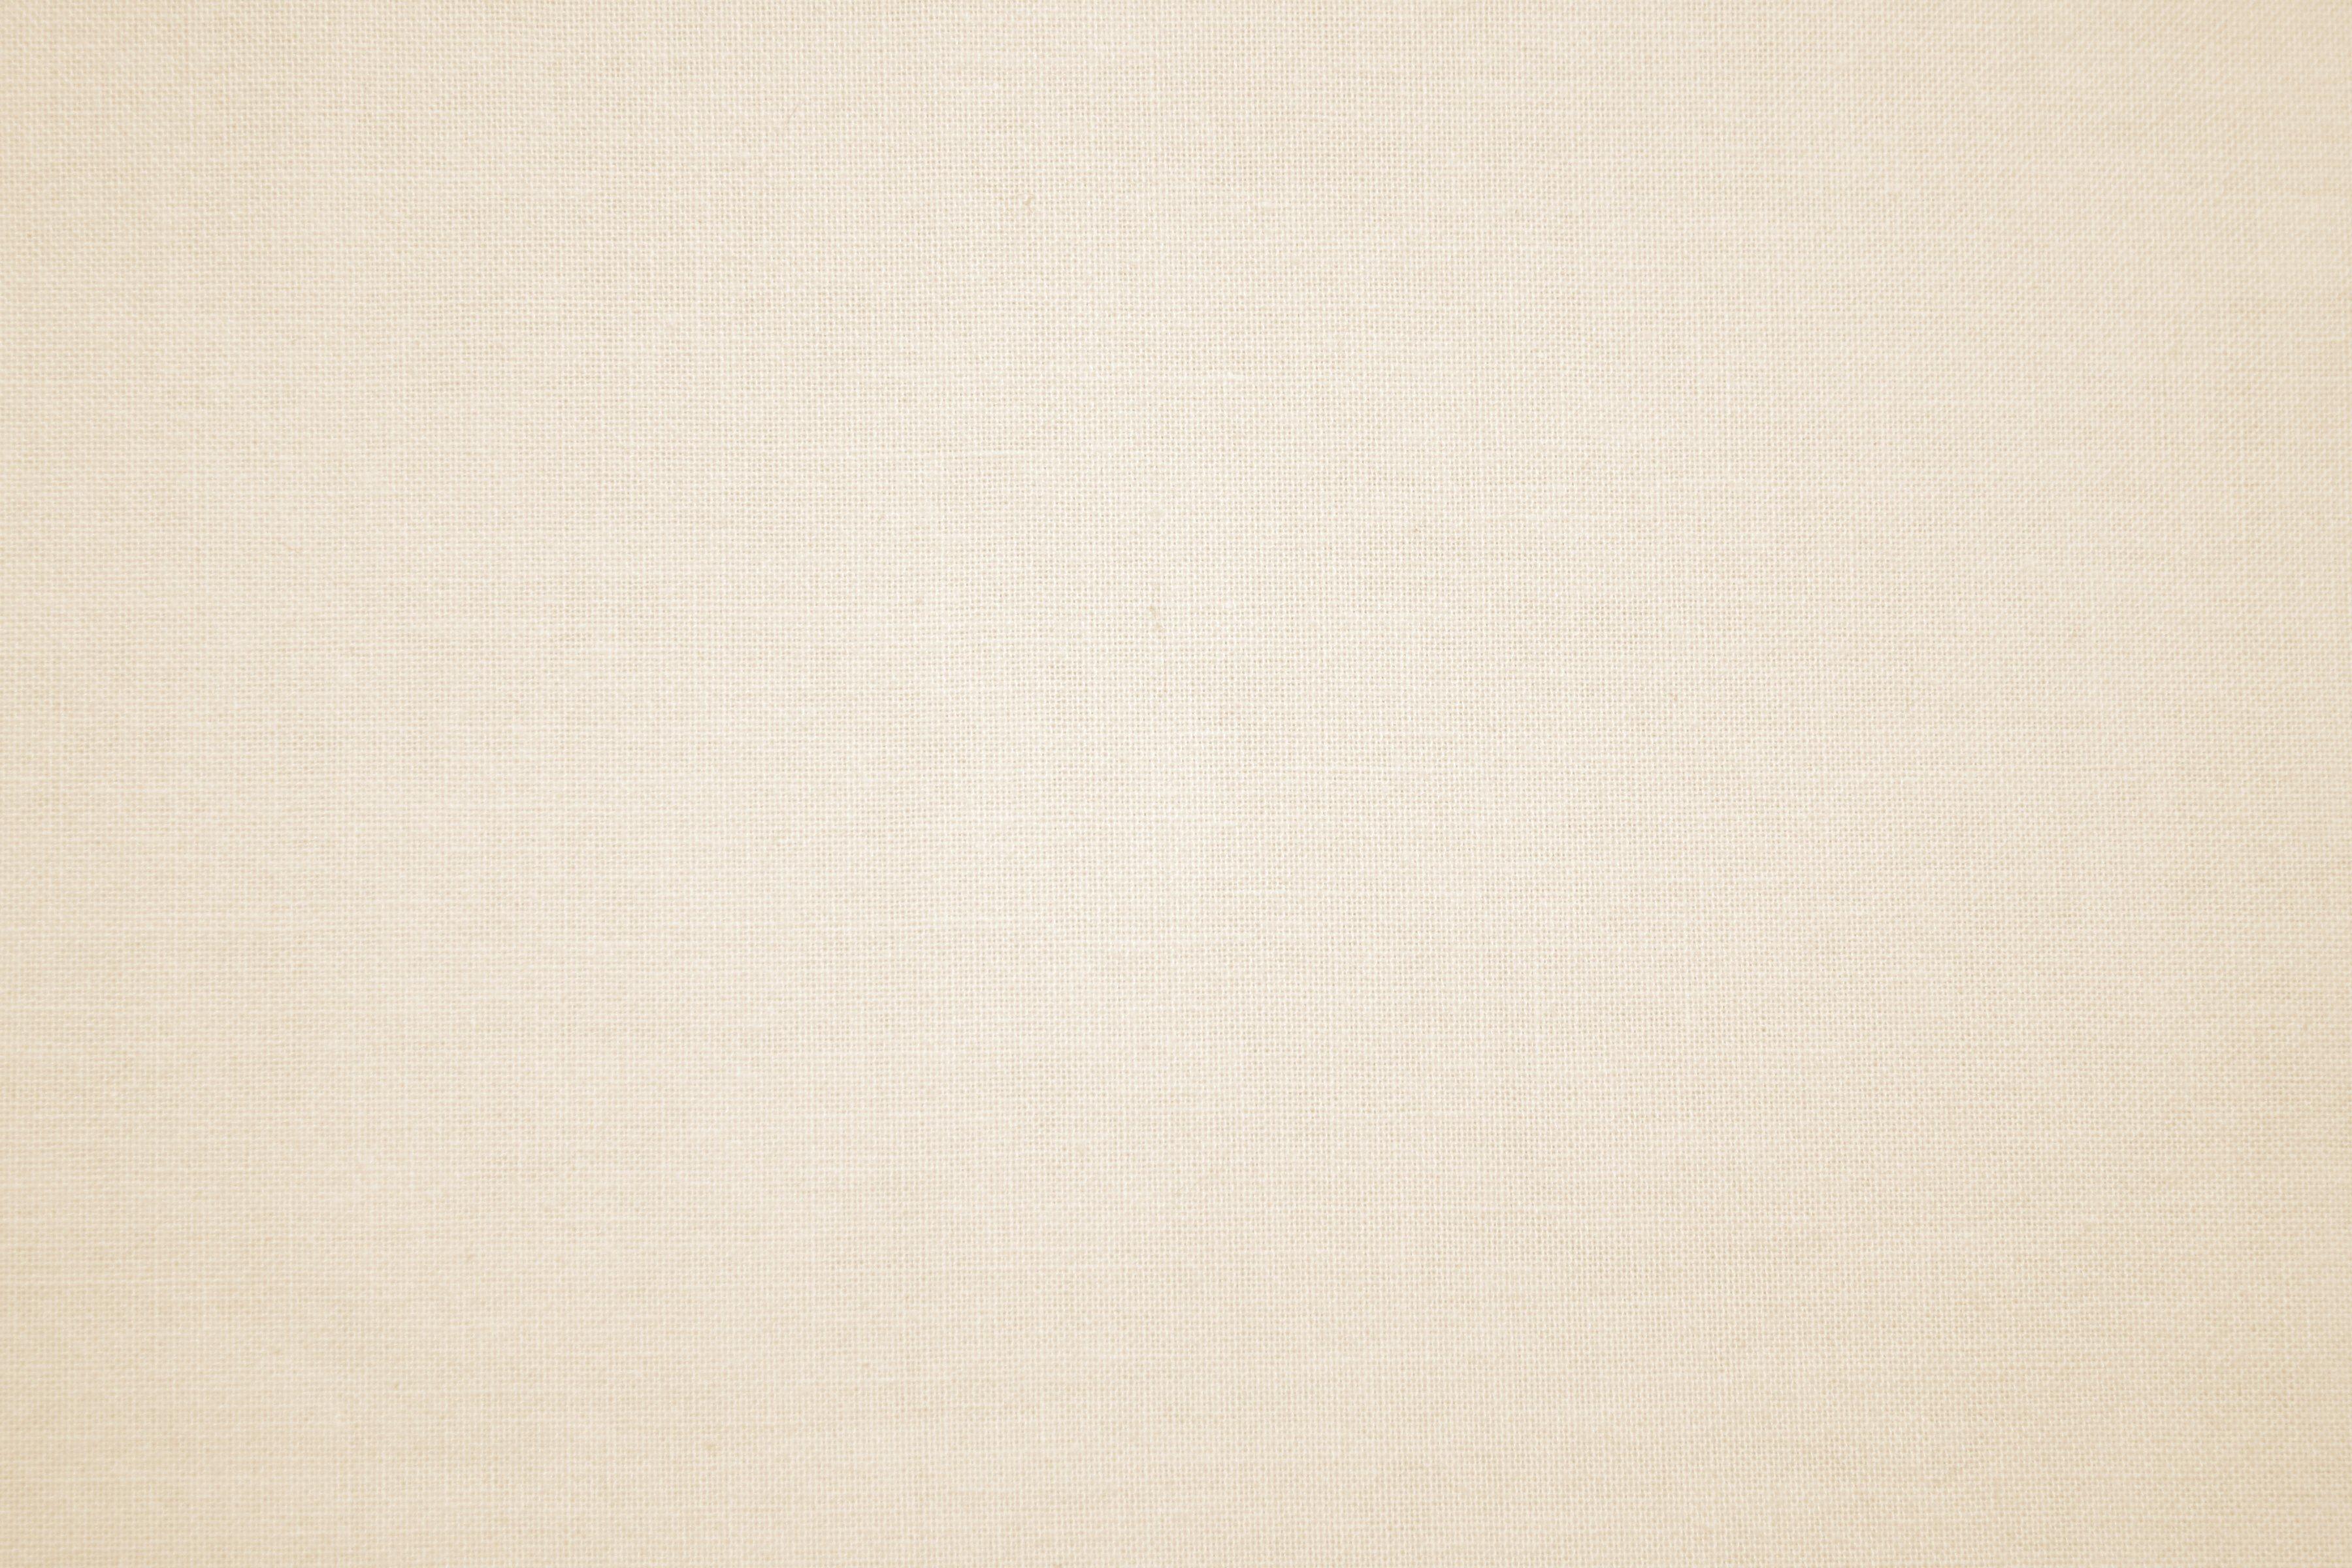 Wallpapers beige   Imagui 3600x2400